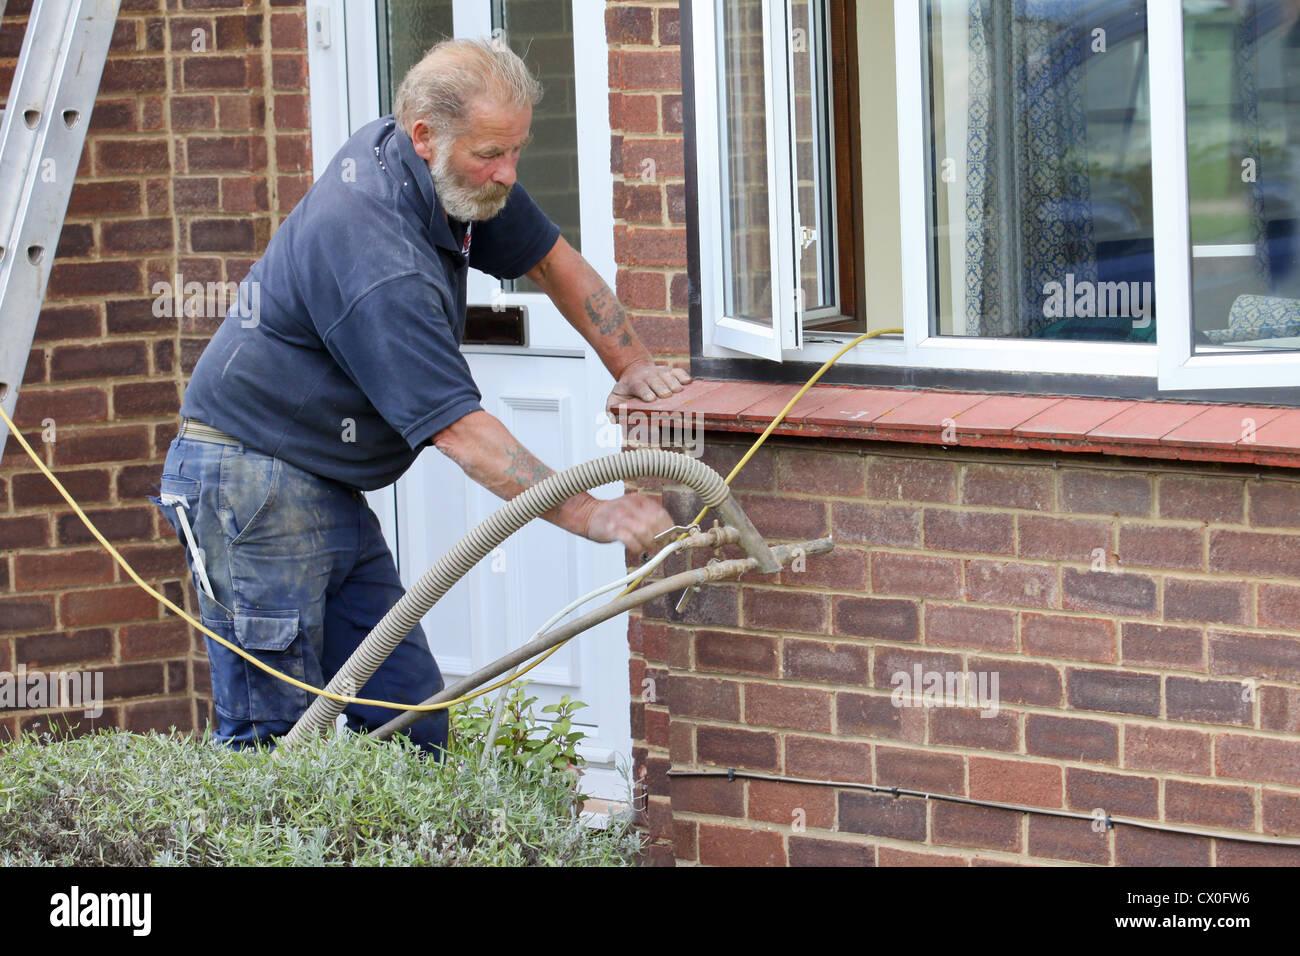 Workman Pumping Polystyrene Bead Cavity Wall Insulation